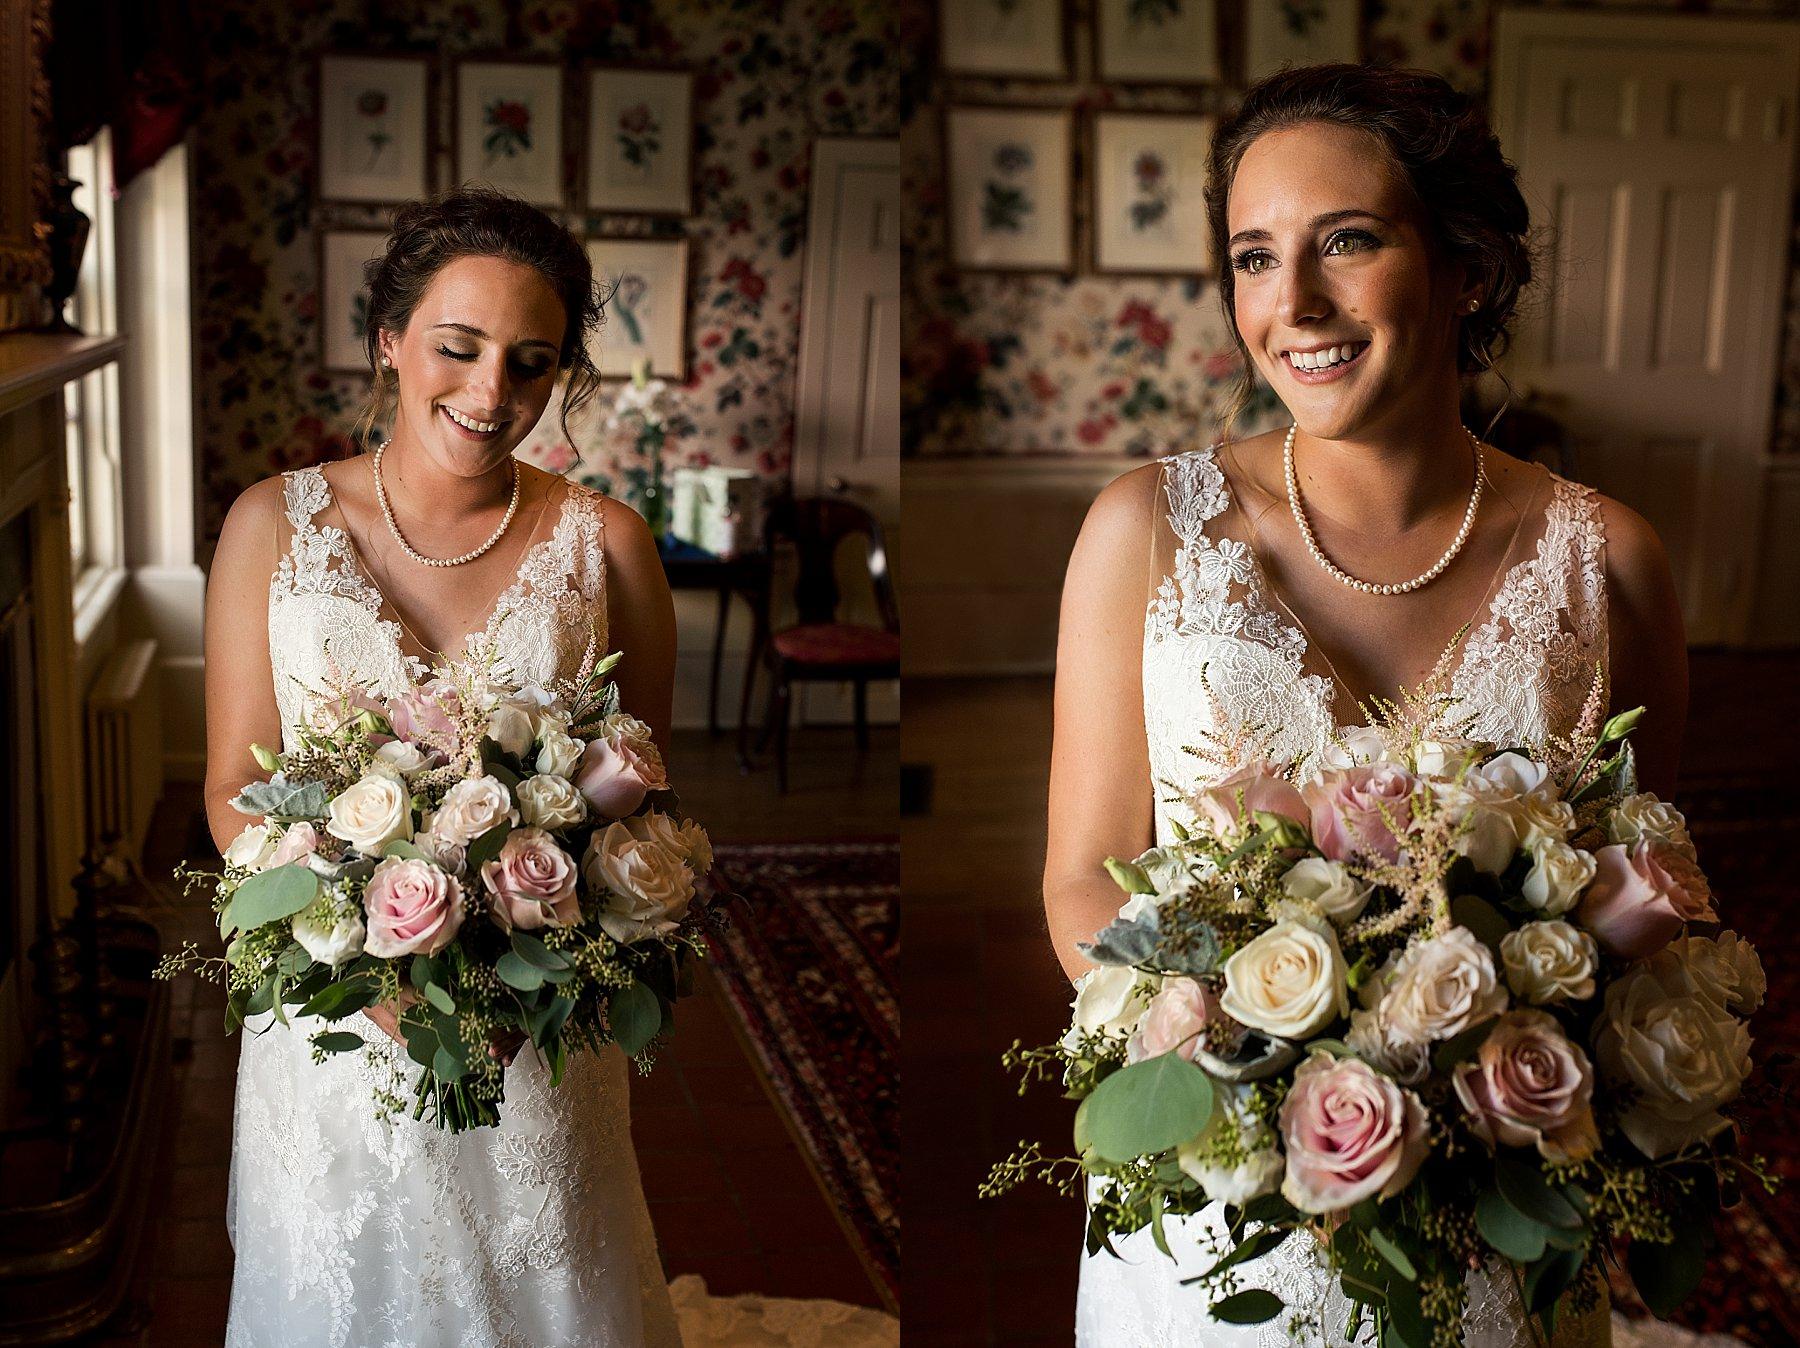 Bride portraits at Hillstead Museum wedding venue